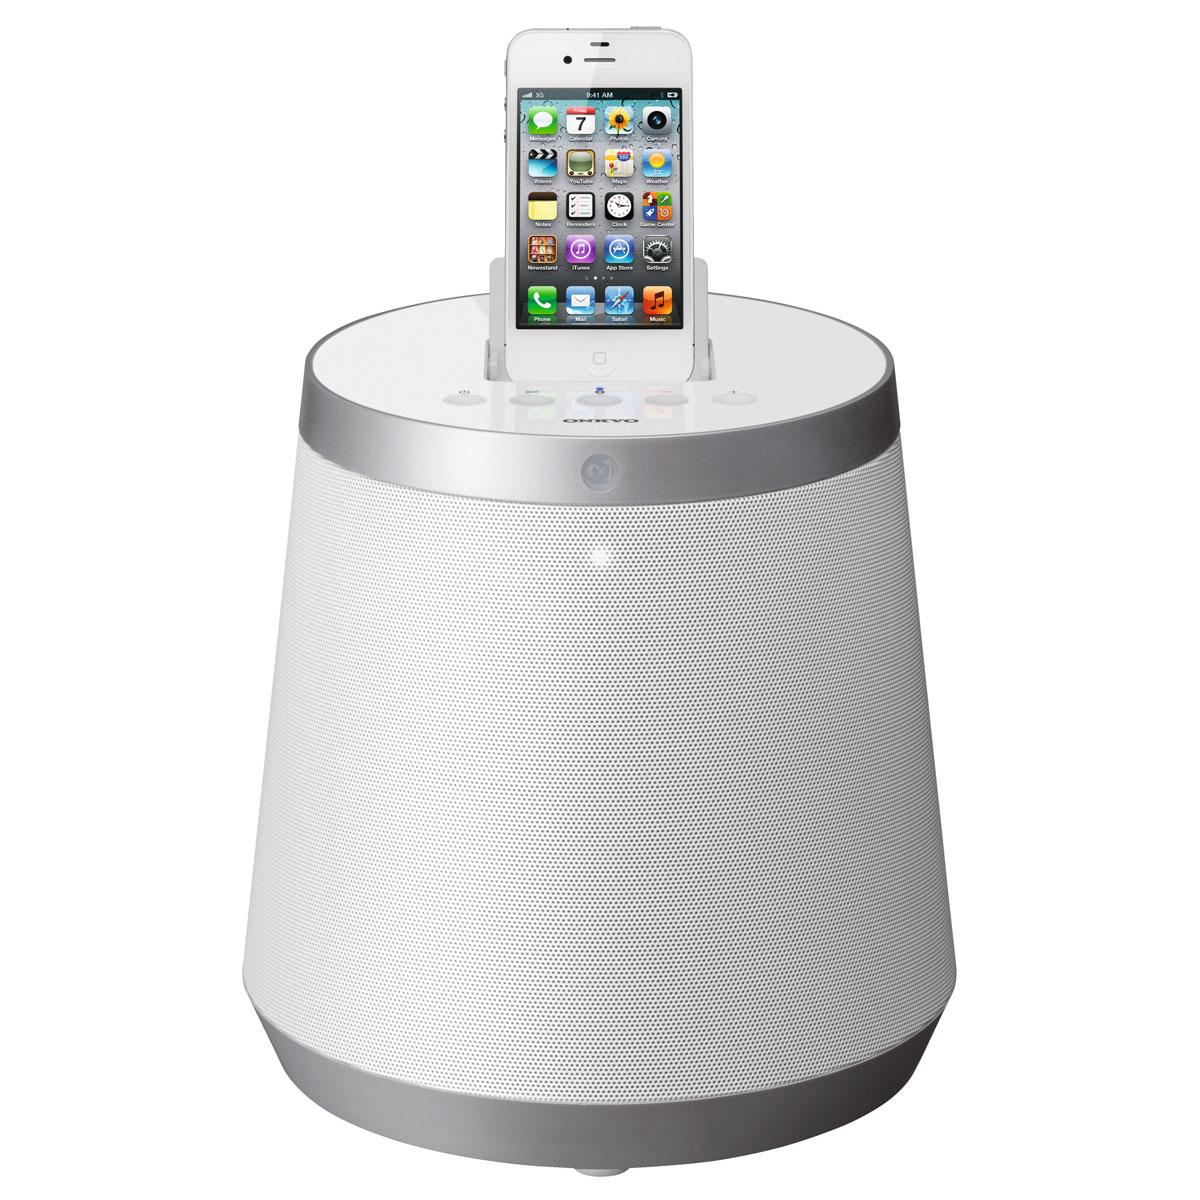 Onkyo rbx 500 blanc dock enceinte bluetooth onkyo sur ldlc - Enceinte iphone ipad ...